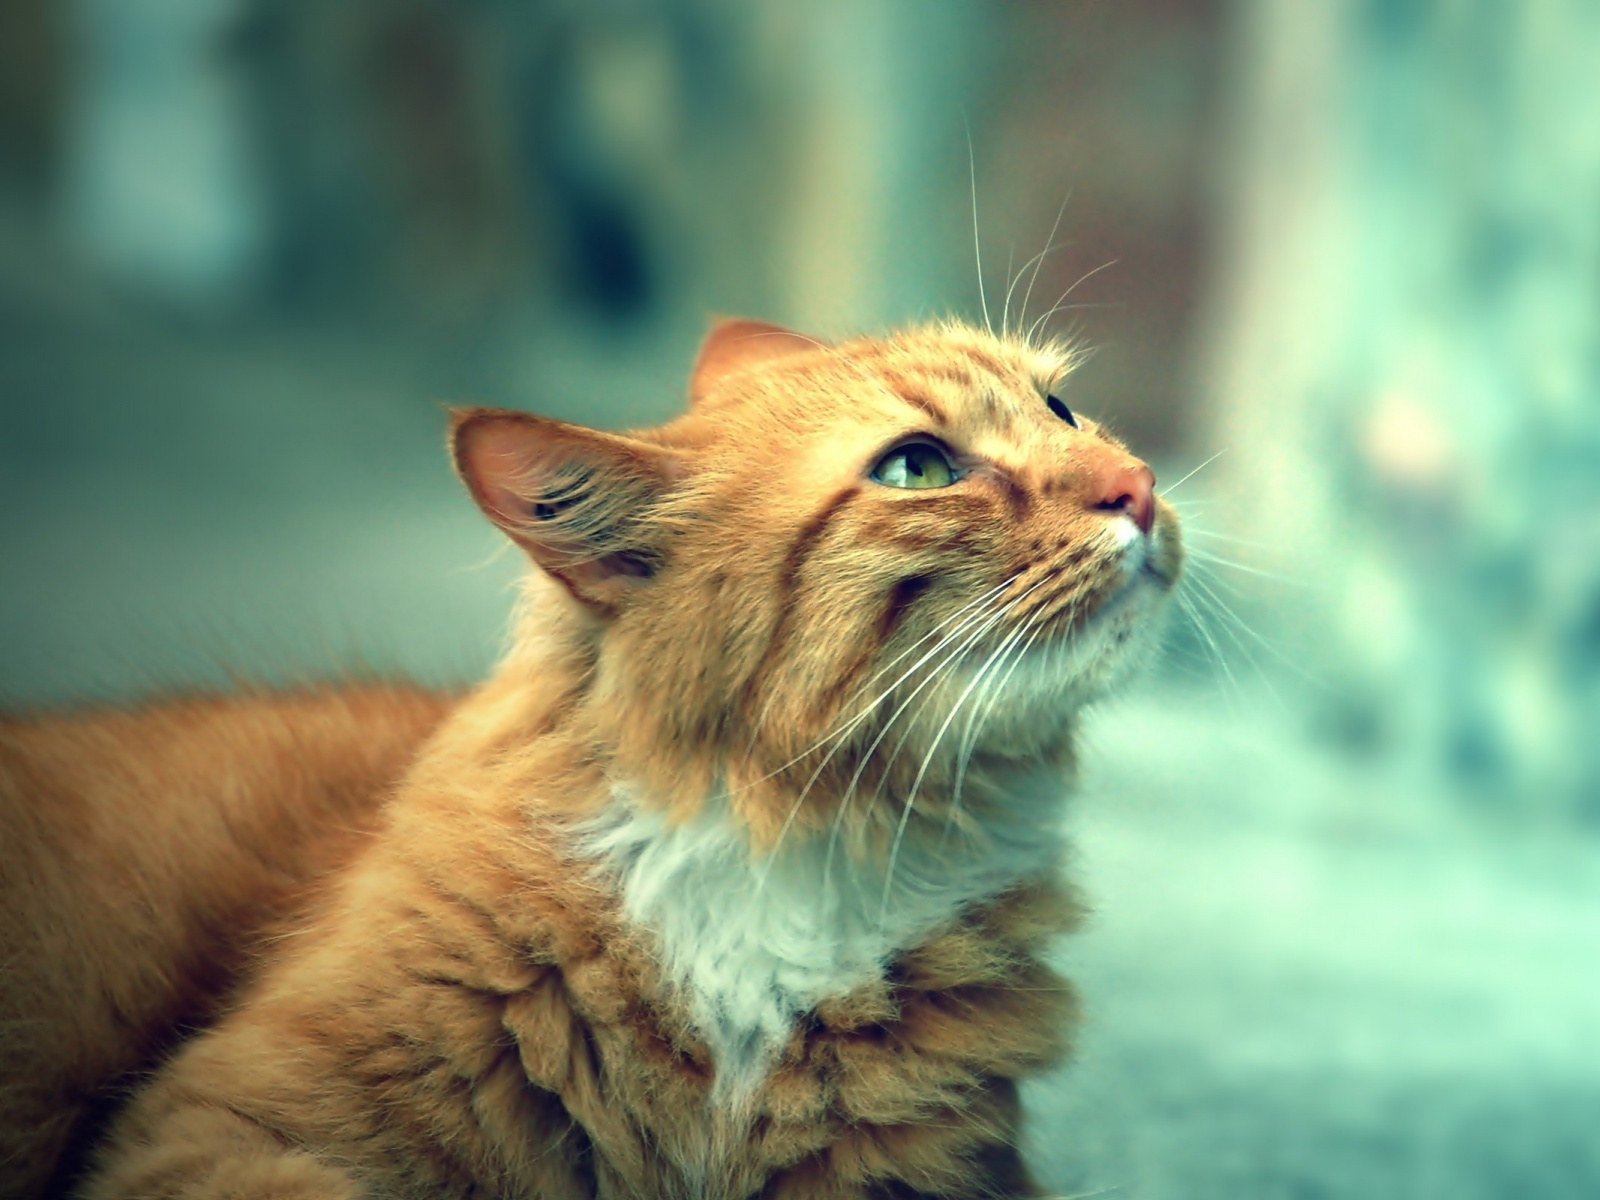 http://vignette1.wikia.nocookie.net/animal-jam-clans-1/images/4/43/Light-brown-Cat-1600x1200.jpg/revision/latest?cb=20160612184752